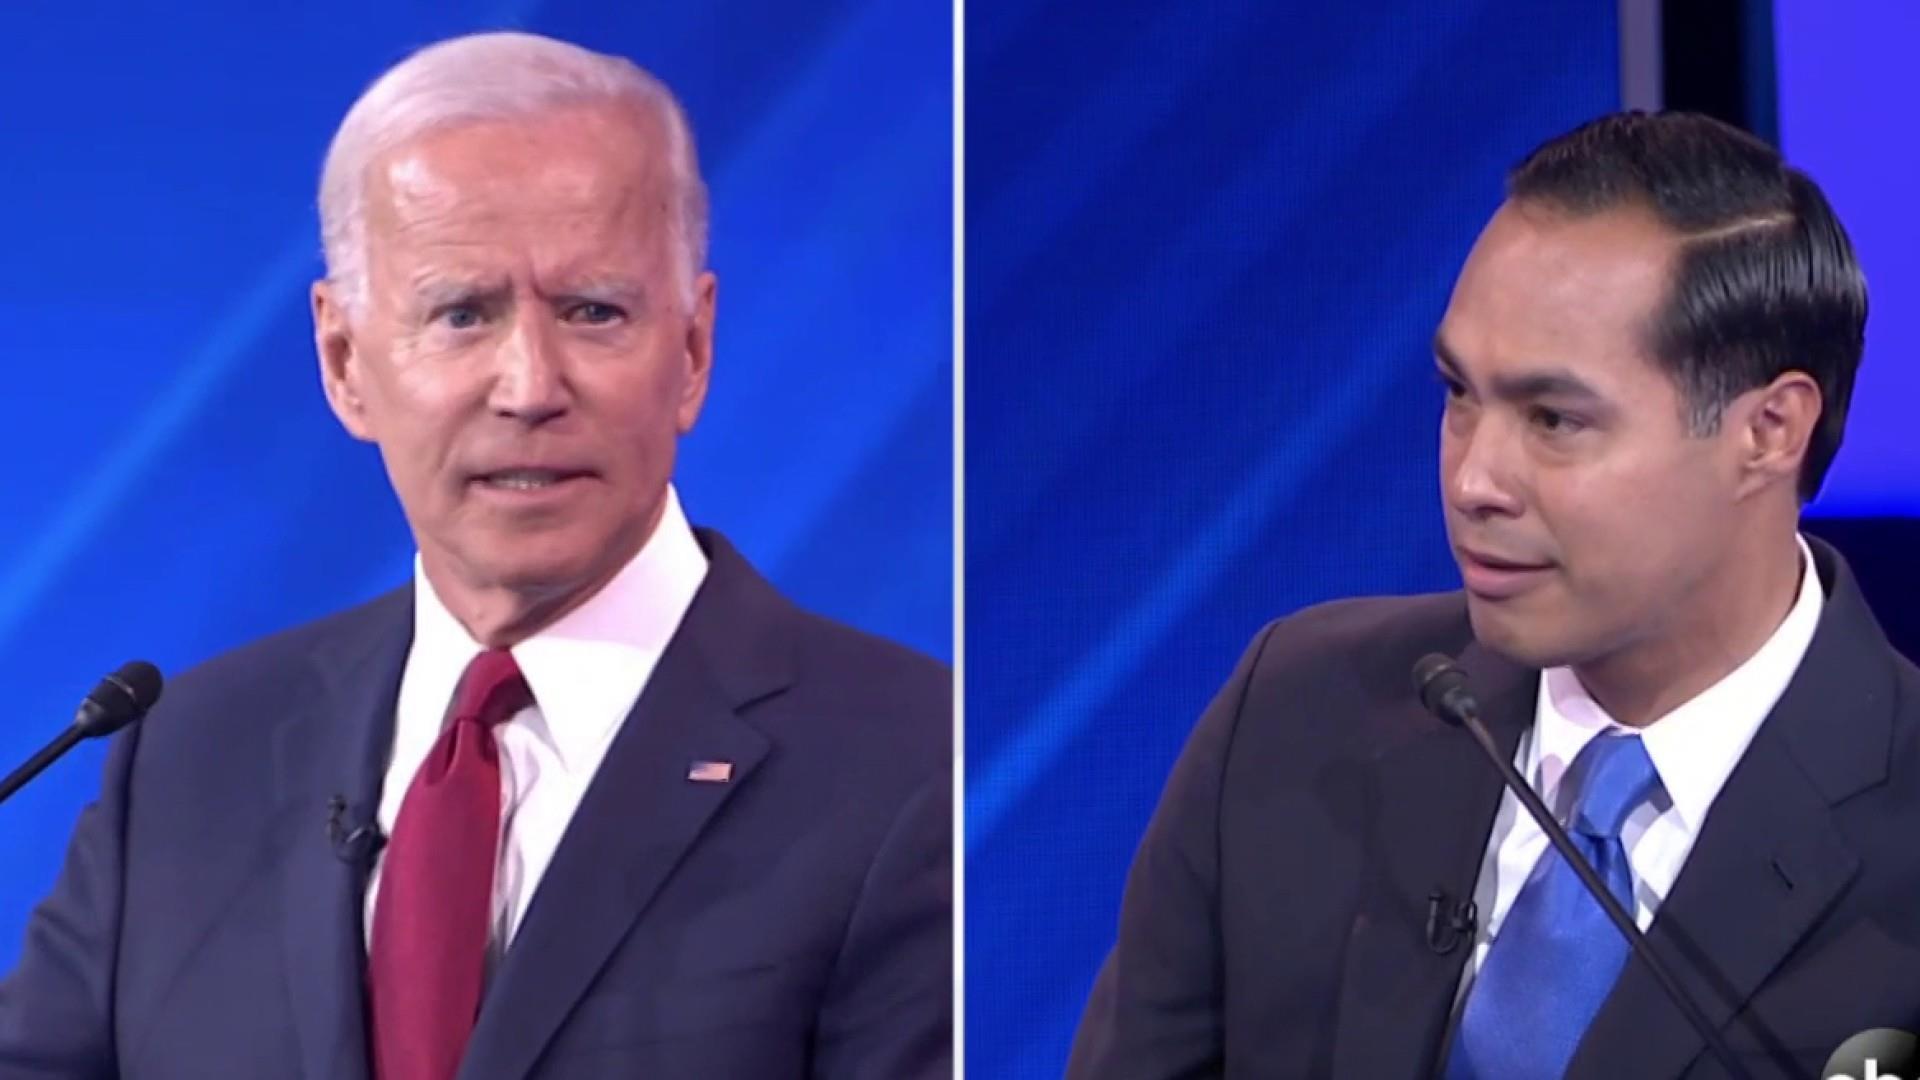 Biden's controversial debate response on legacy of slavery